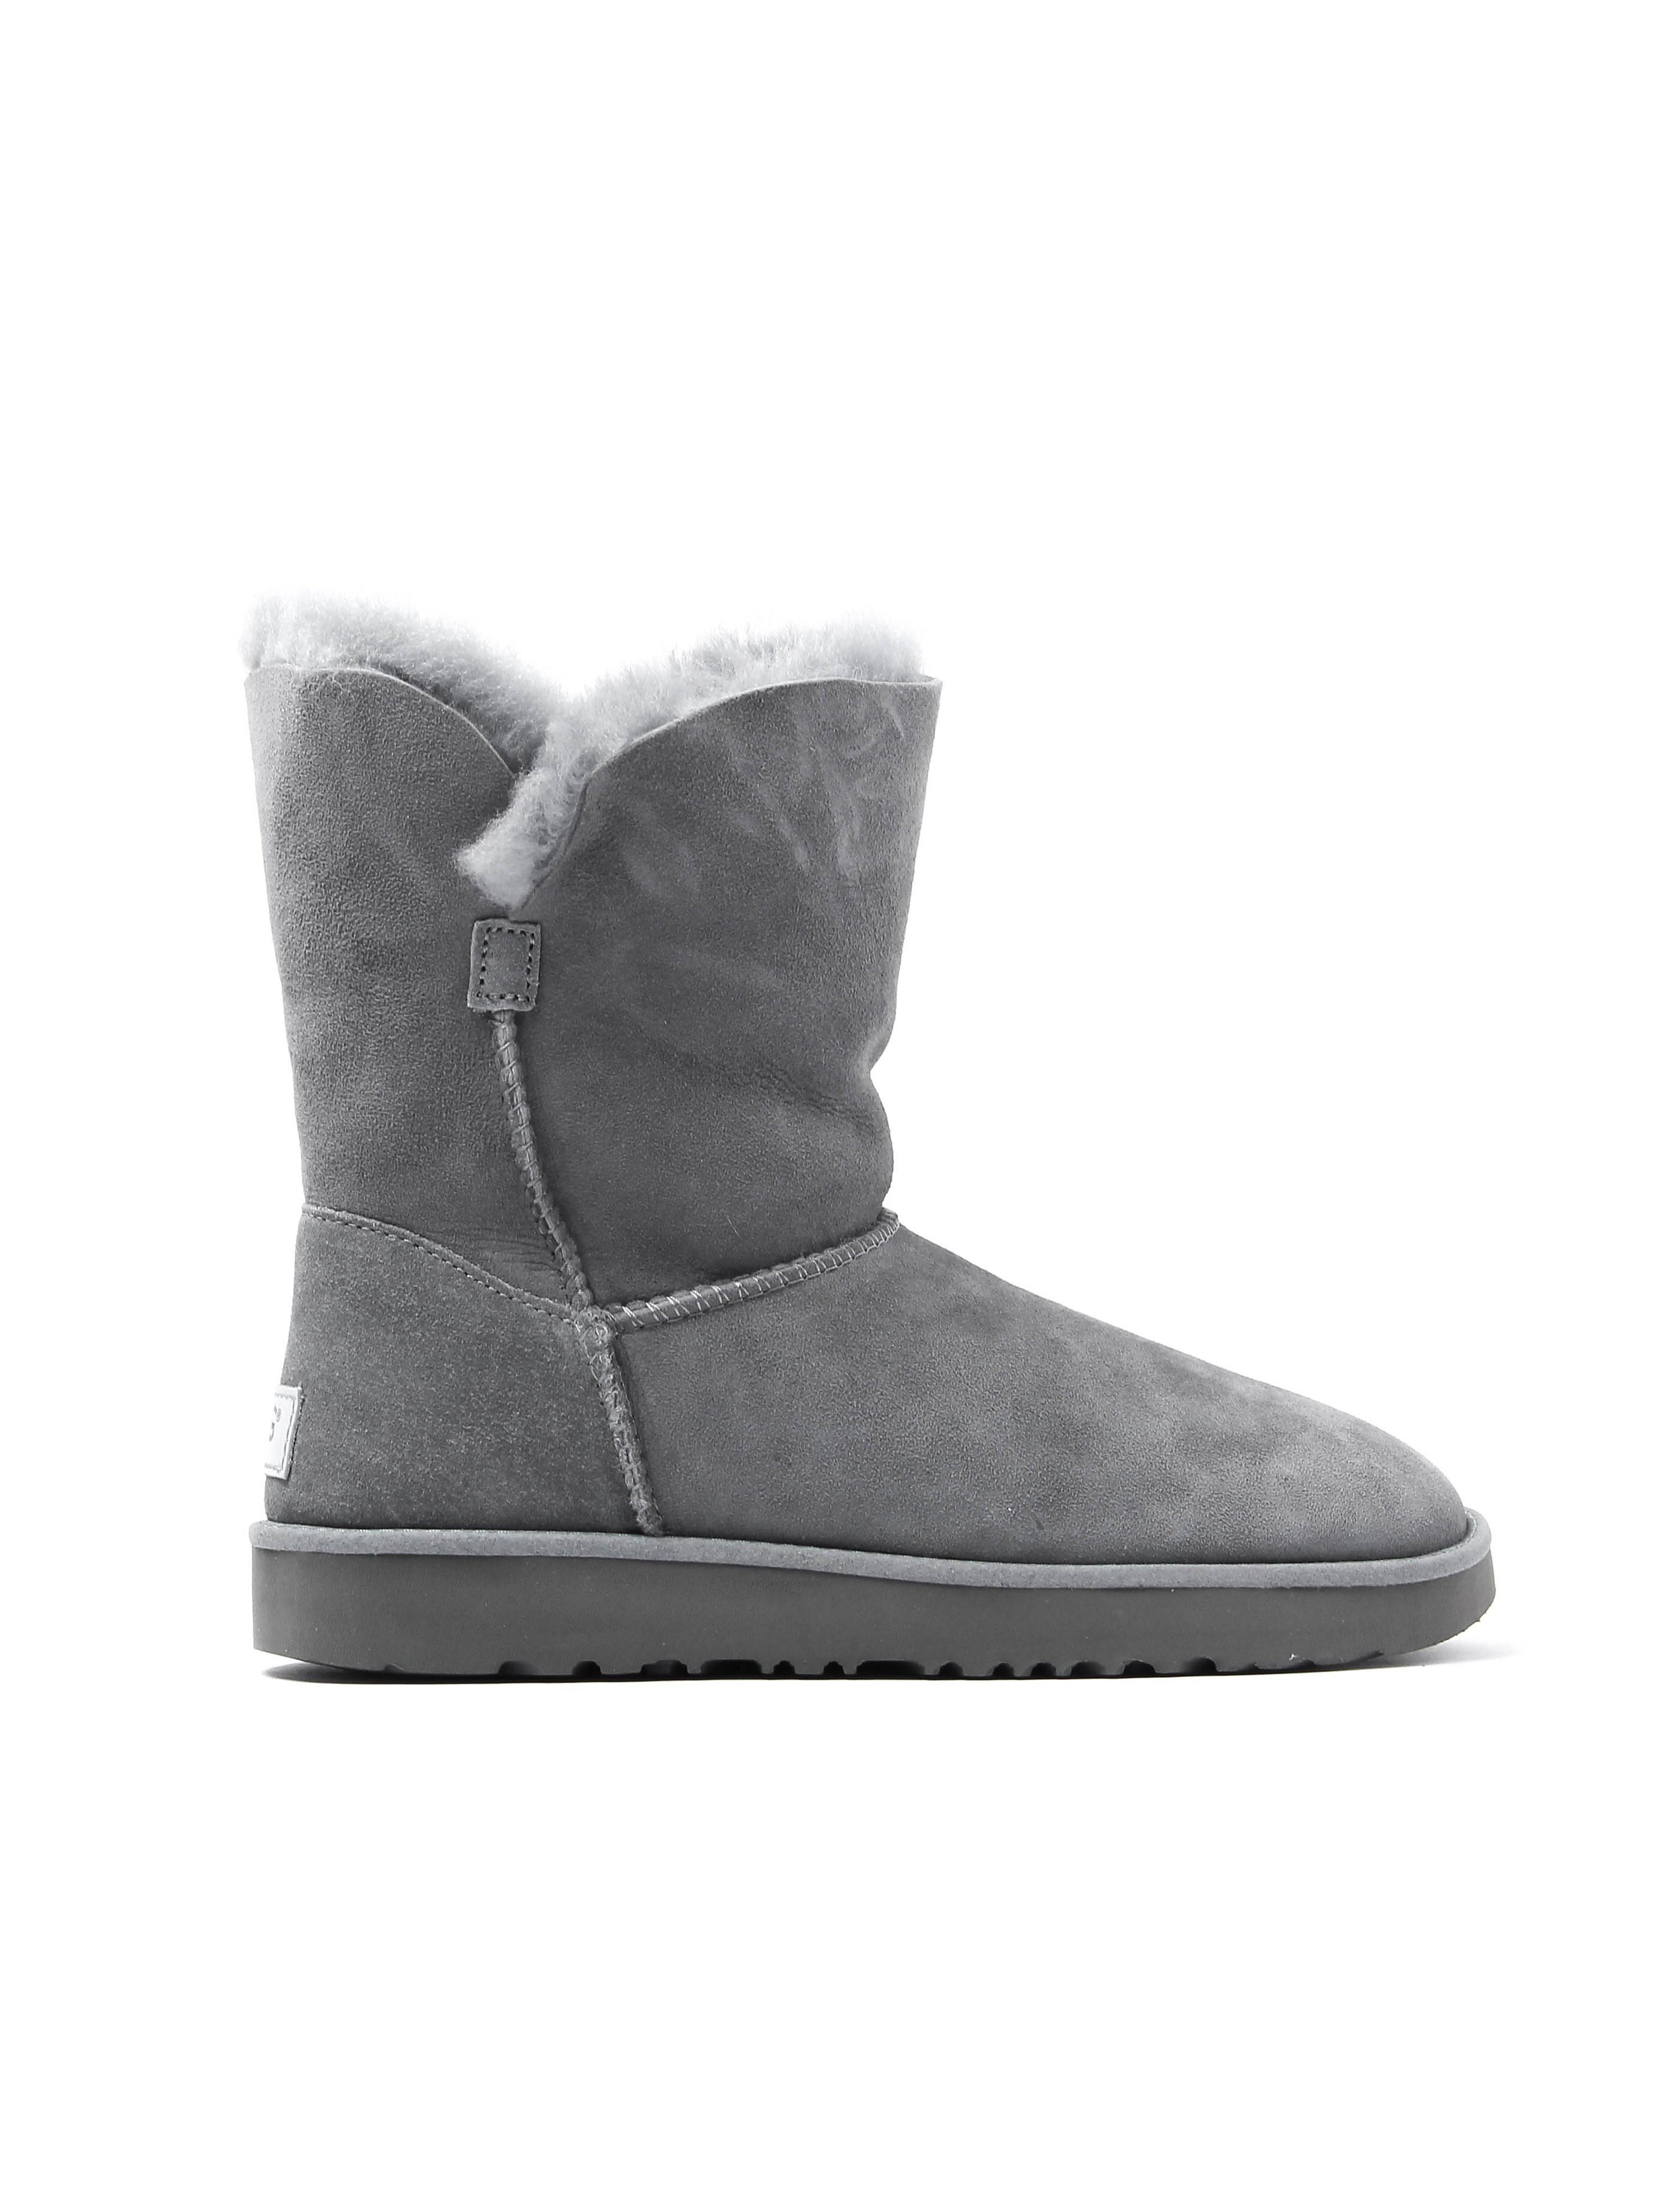 UGG Women's Classic Cuff Short Boots - Geyser Grey